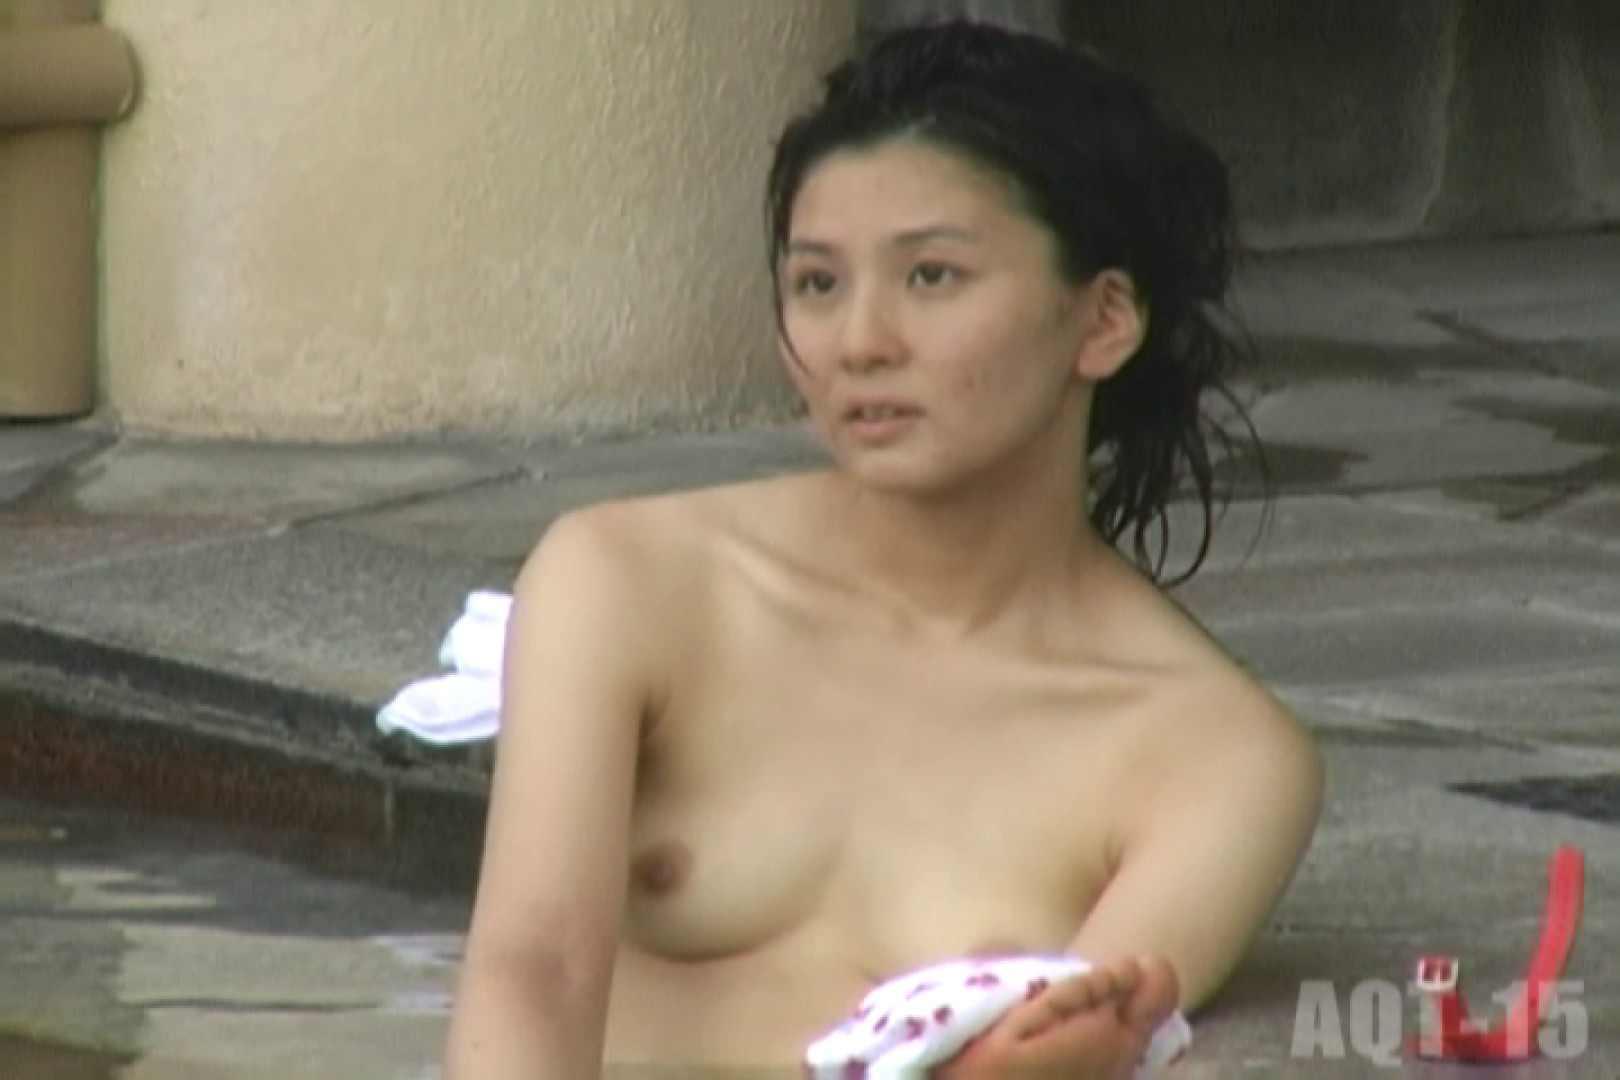 Aquaな露天風呂Vol.832 露天 オマンコ無修正動画無料 93連発 38